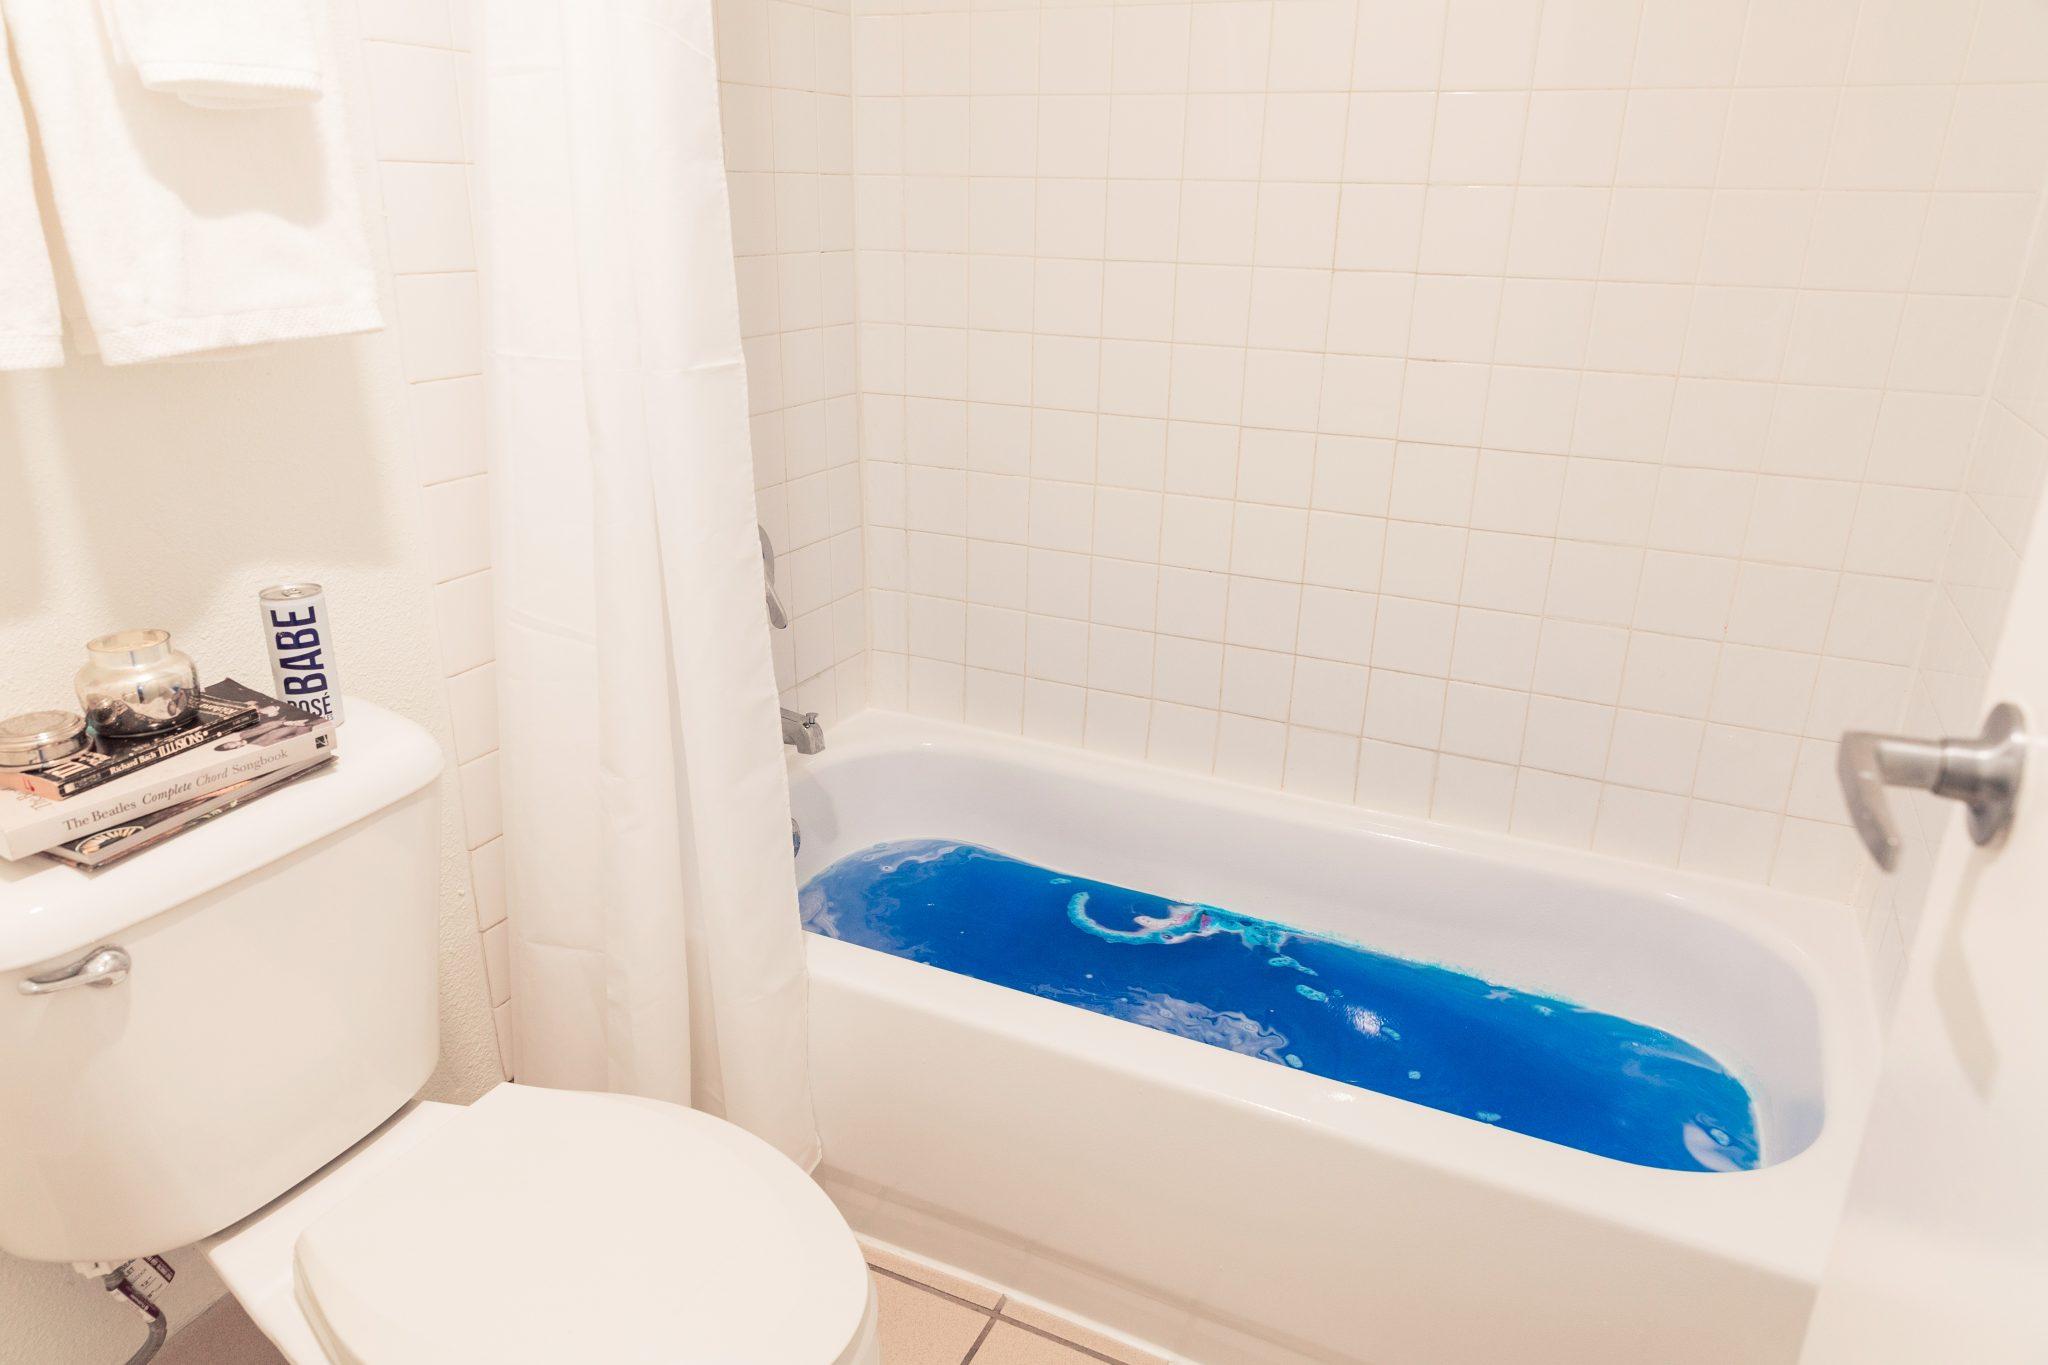 Stay – The Rambler Motel Rambler Bathroom Designs on log home bathroom designs, french country bathroom designs, split level bathroom designs, farm house bathroom designs, transitional bathroom designs,